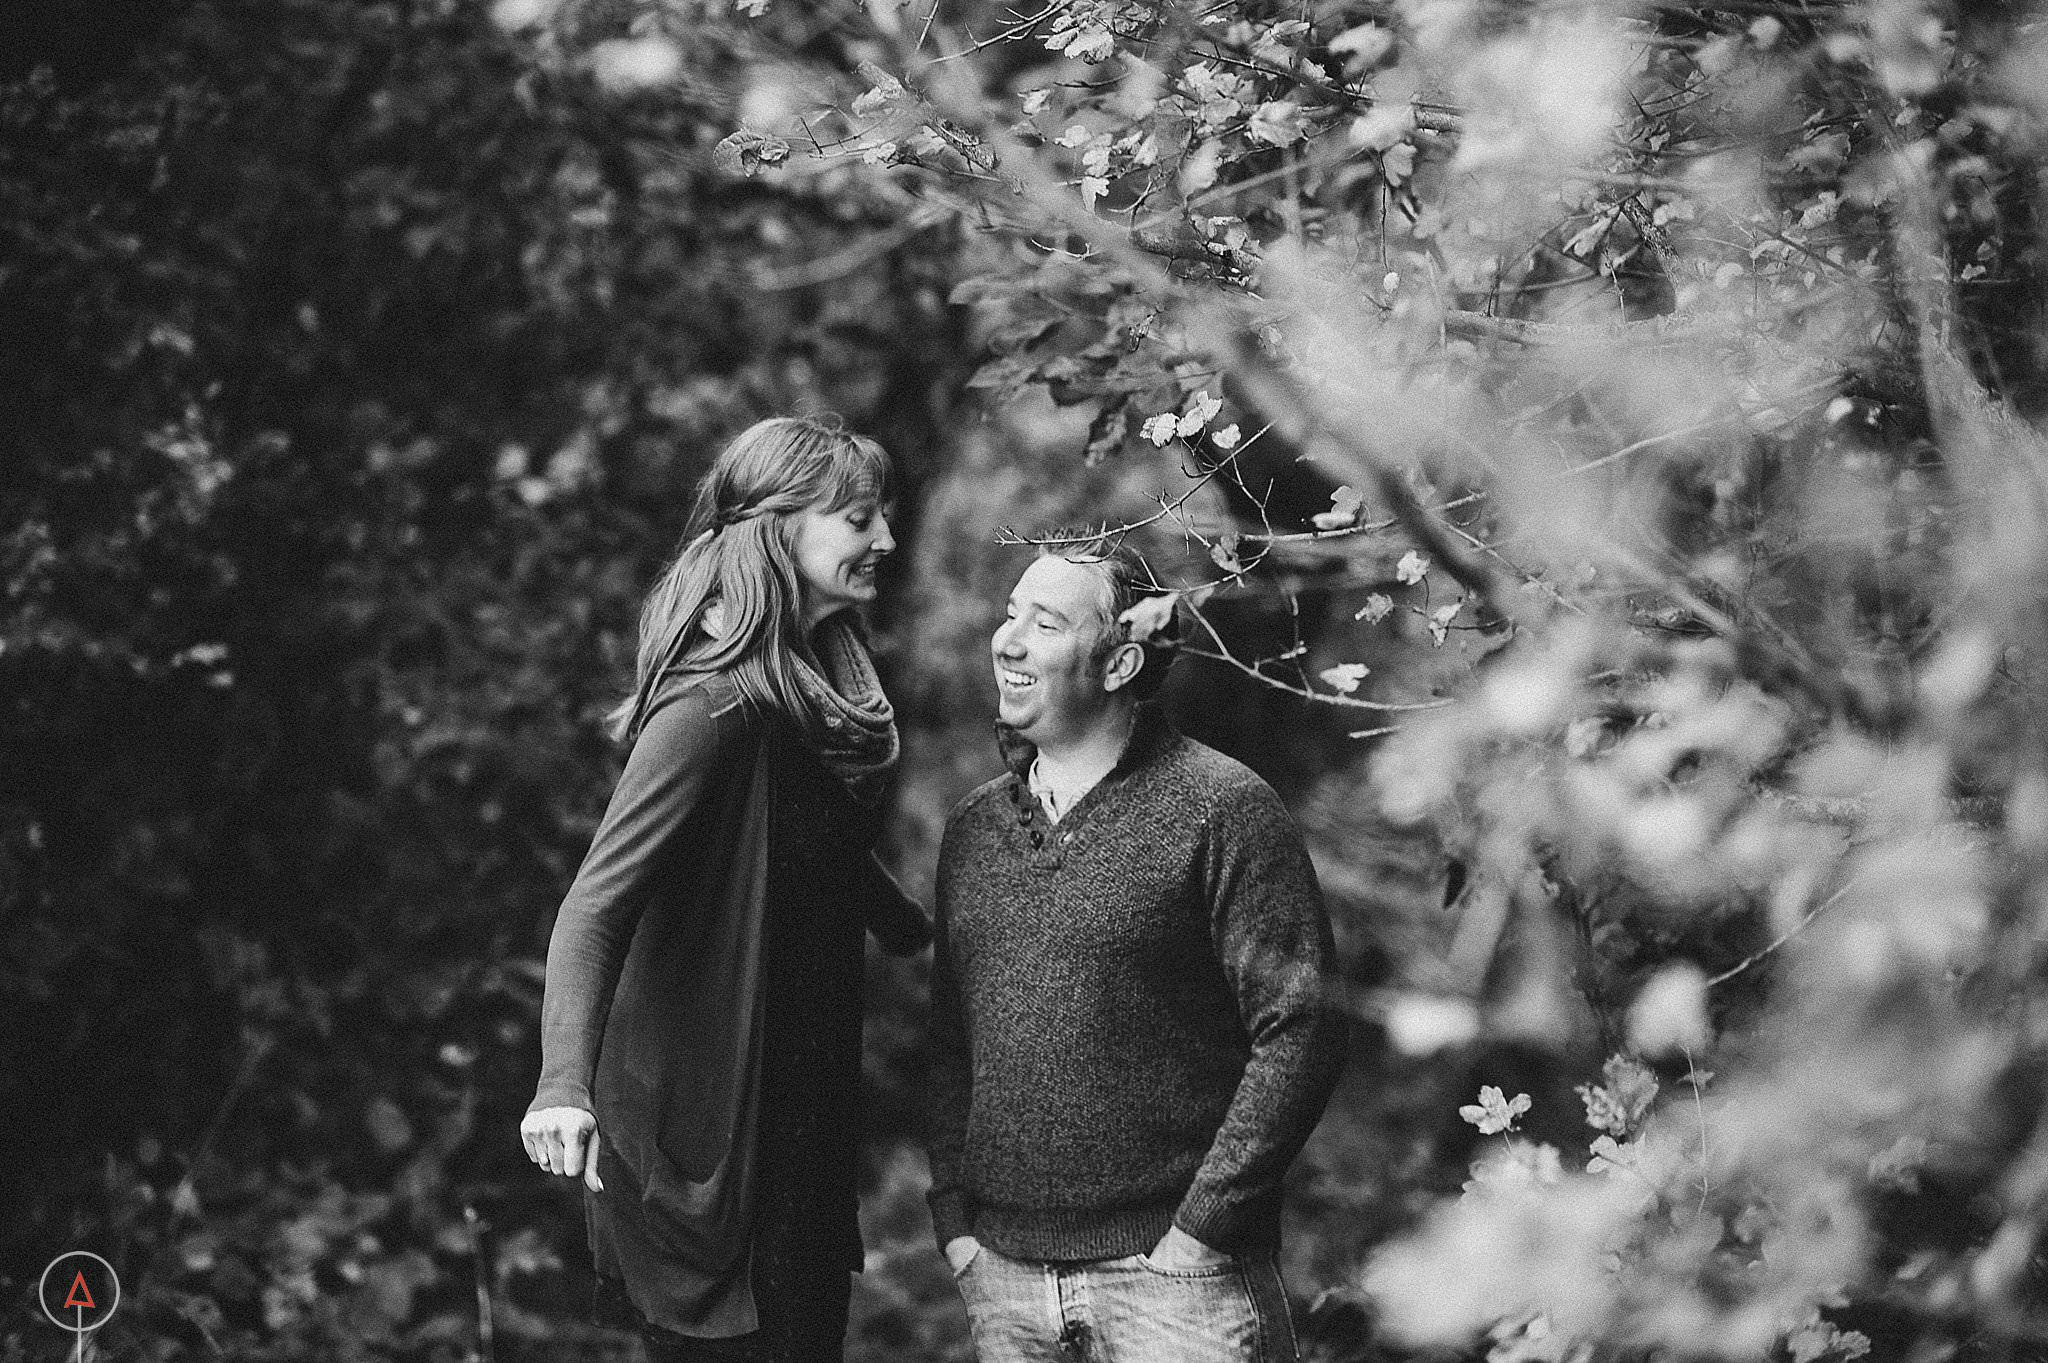 South-Wales-Pre-Wedding-Photography-Aga-Tomaszek-00007